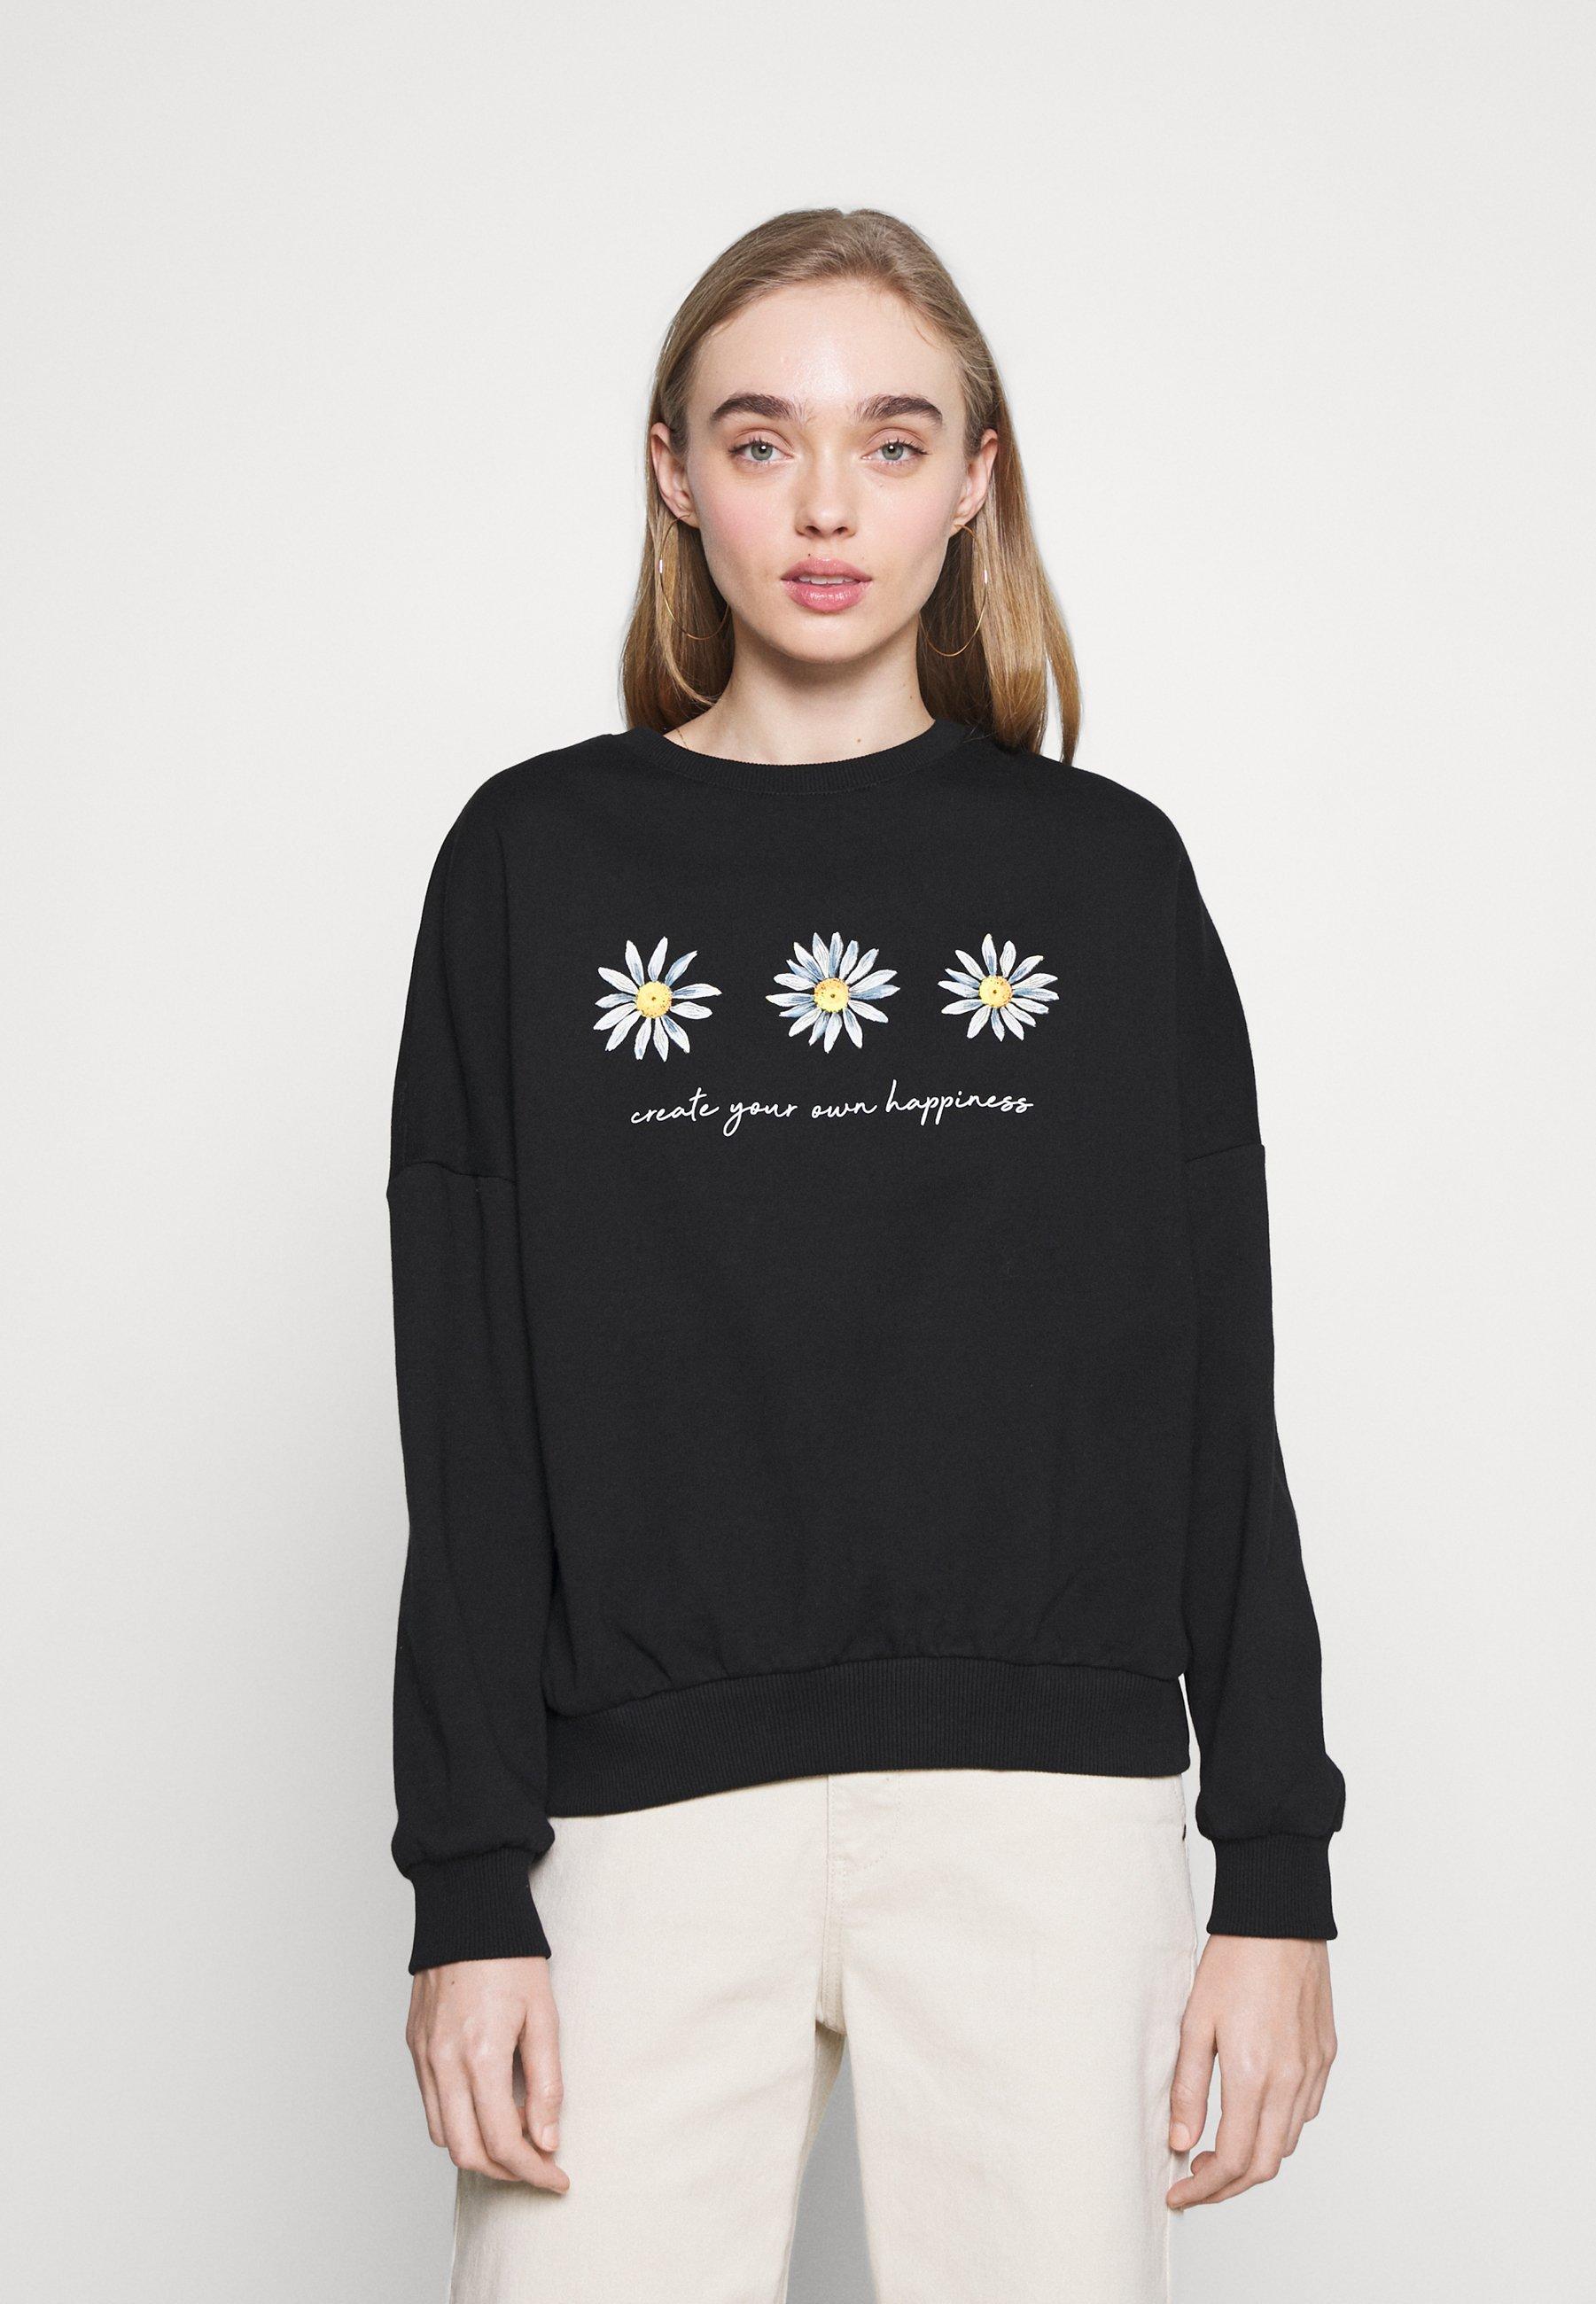 Women Printed Crew Neck Sweatshirt - Sweatshirt